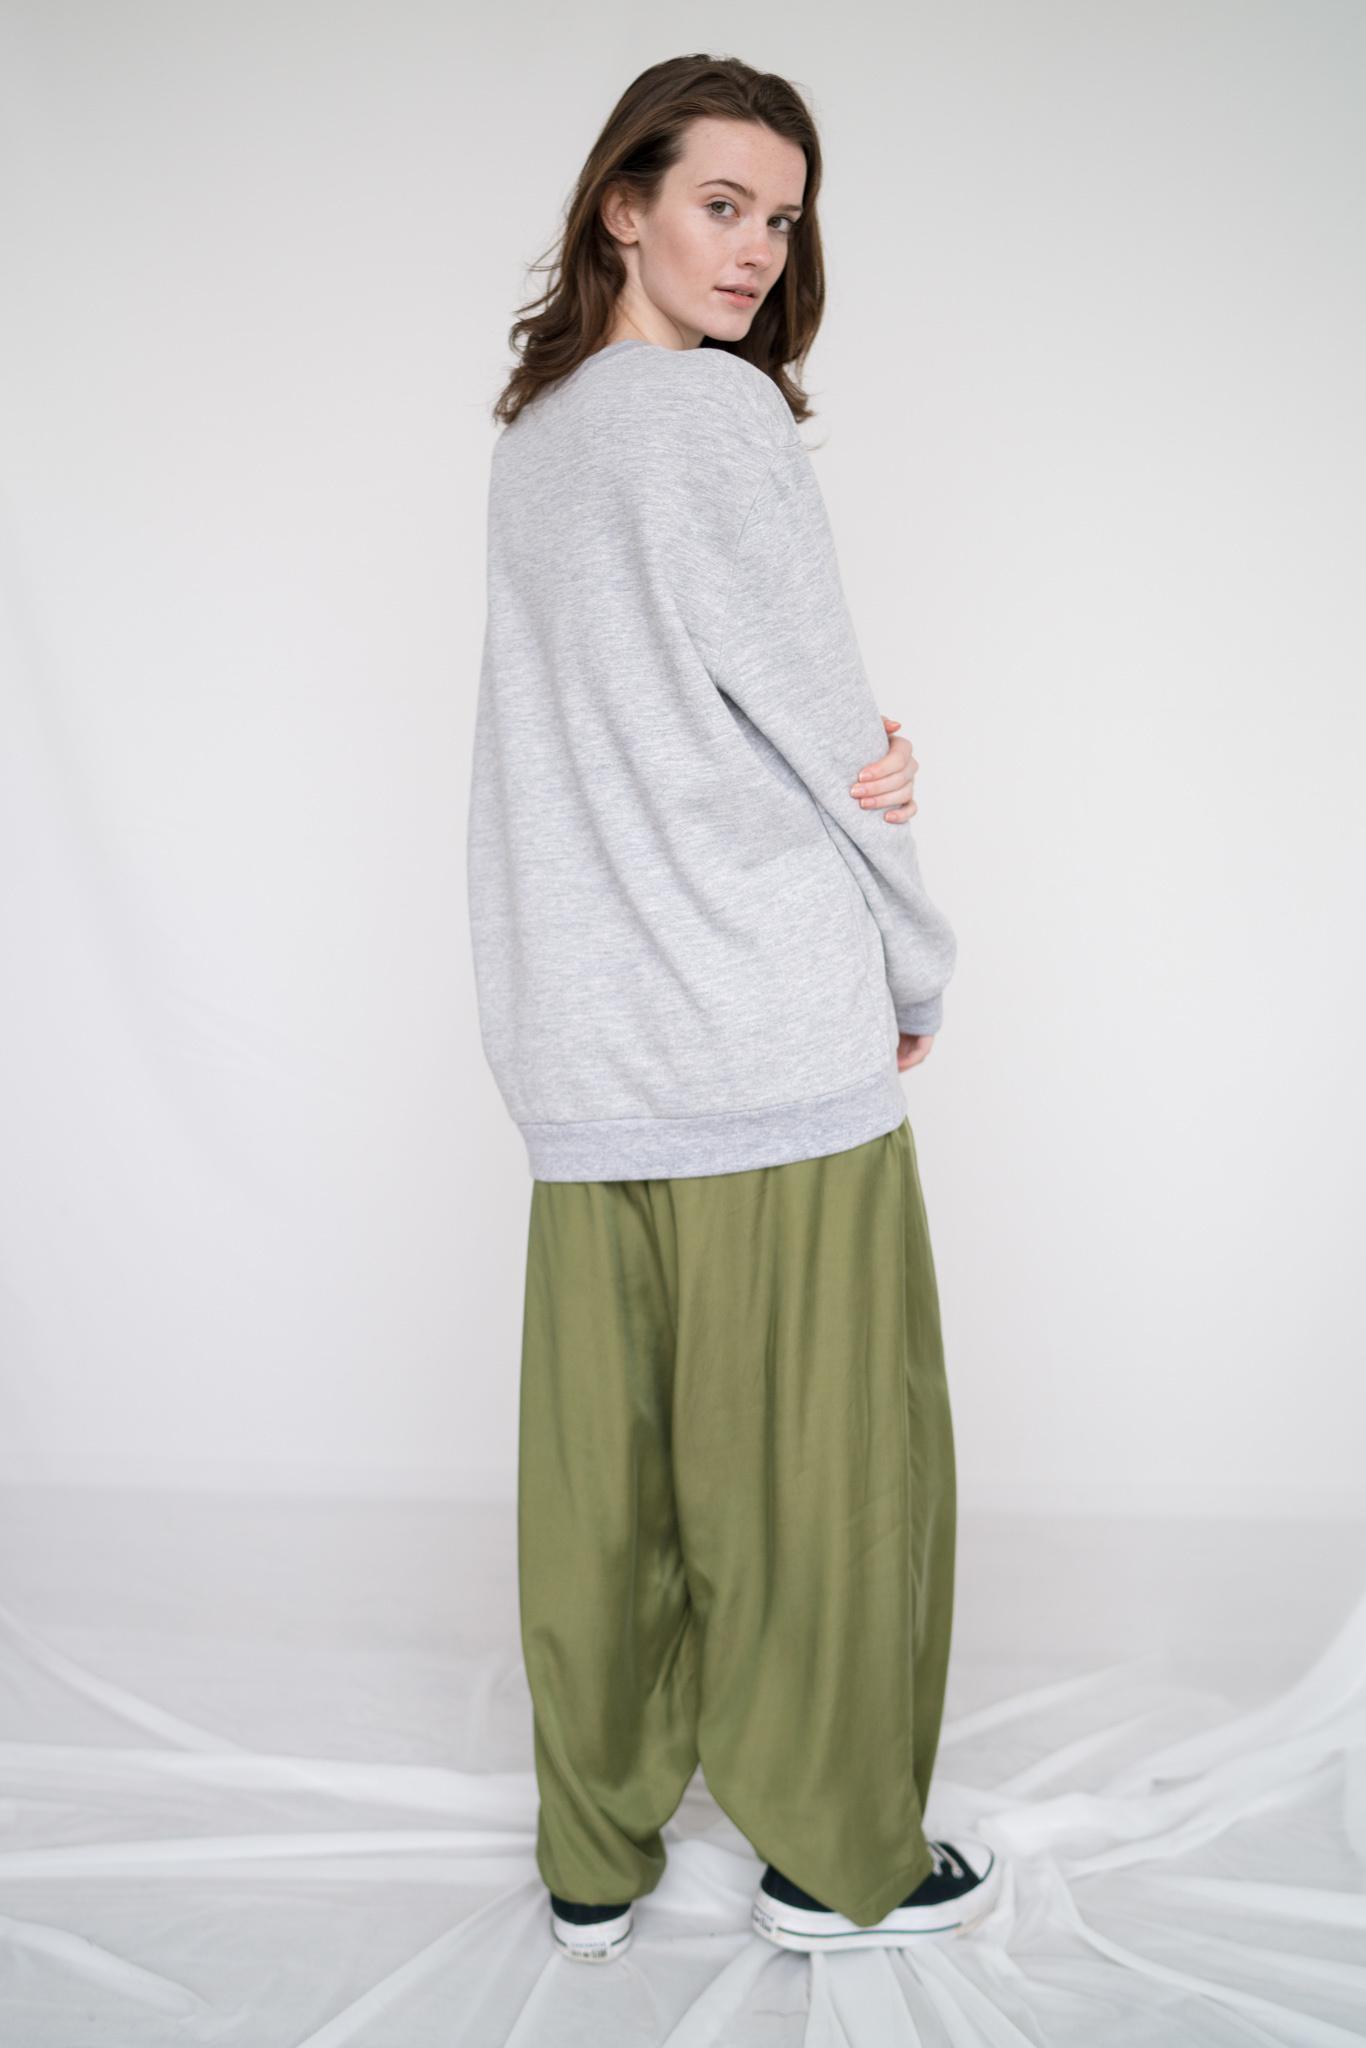 Unisex Crew sweatshirt Heather Grey